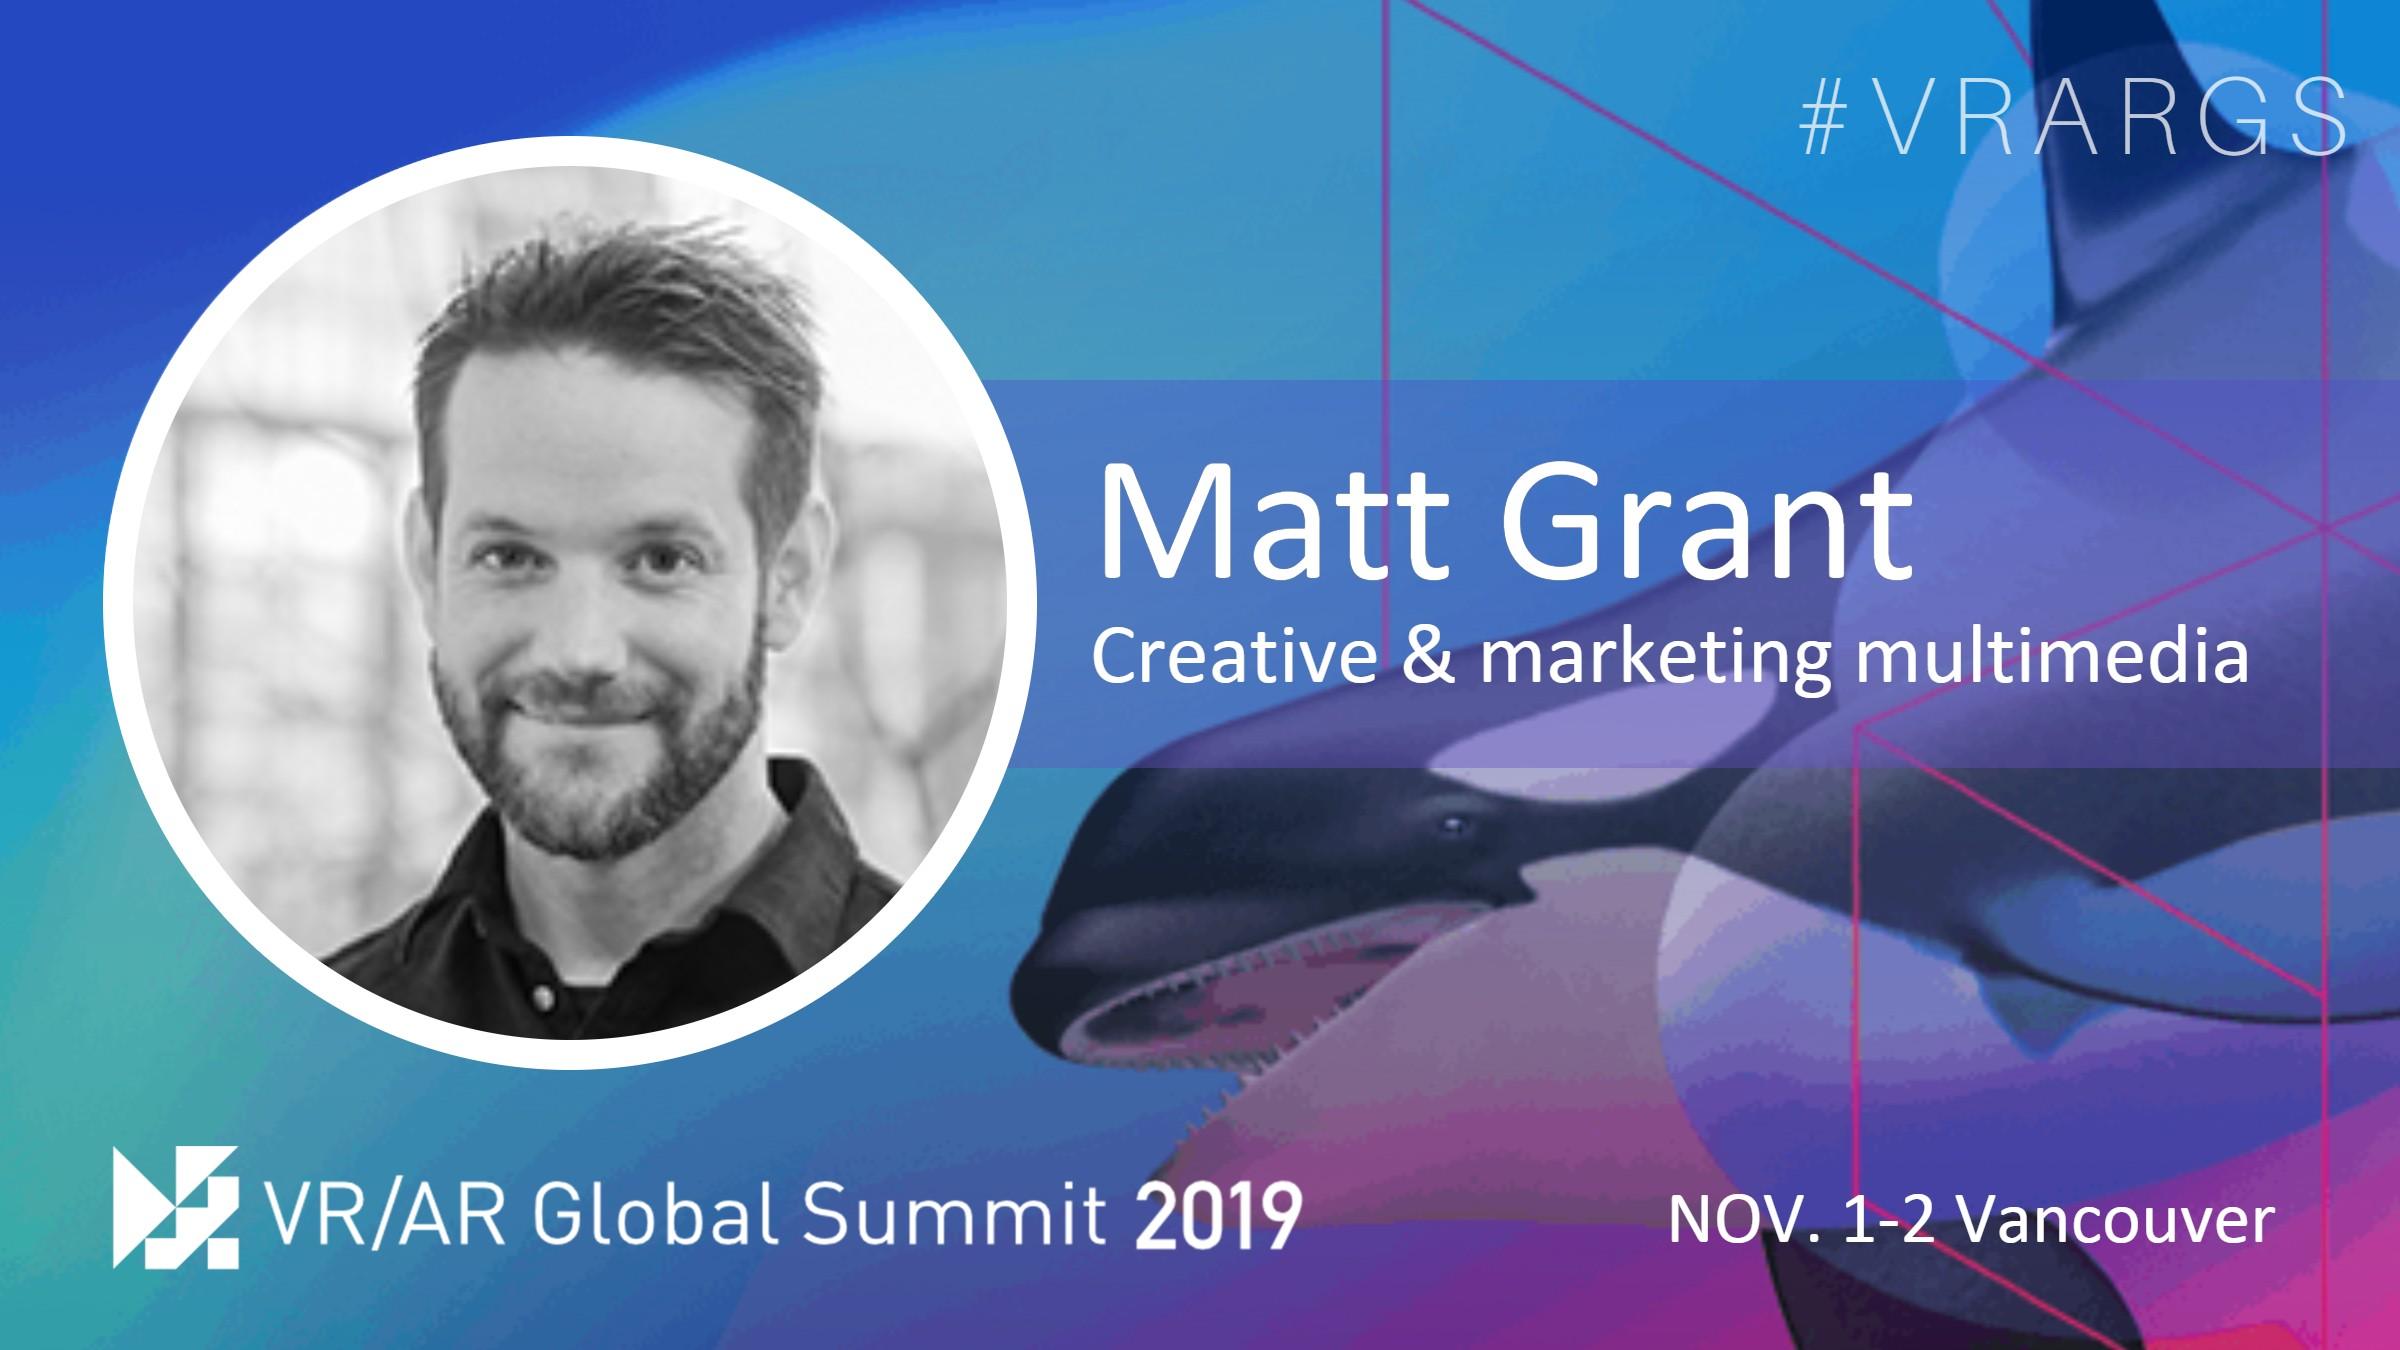 HighRes-Matt-Grant-Marketing-VRARGS-VRAR-Global-Summit-Spatial-Computing-Vancouver.jpg